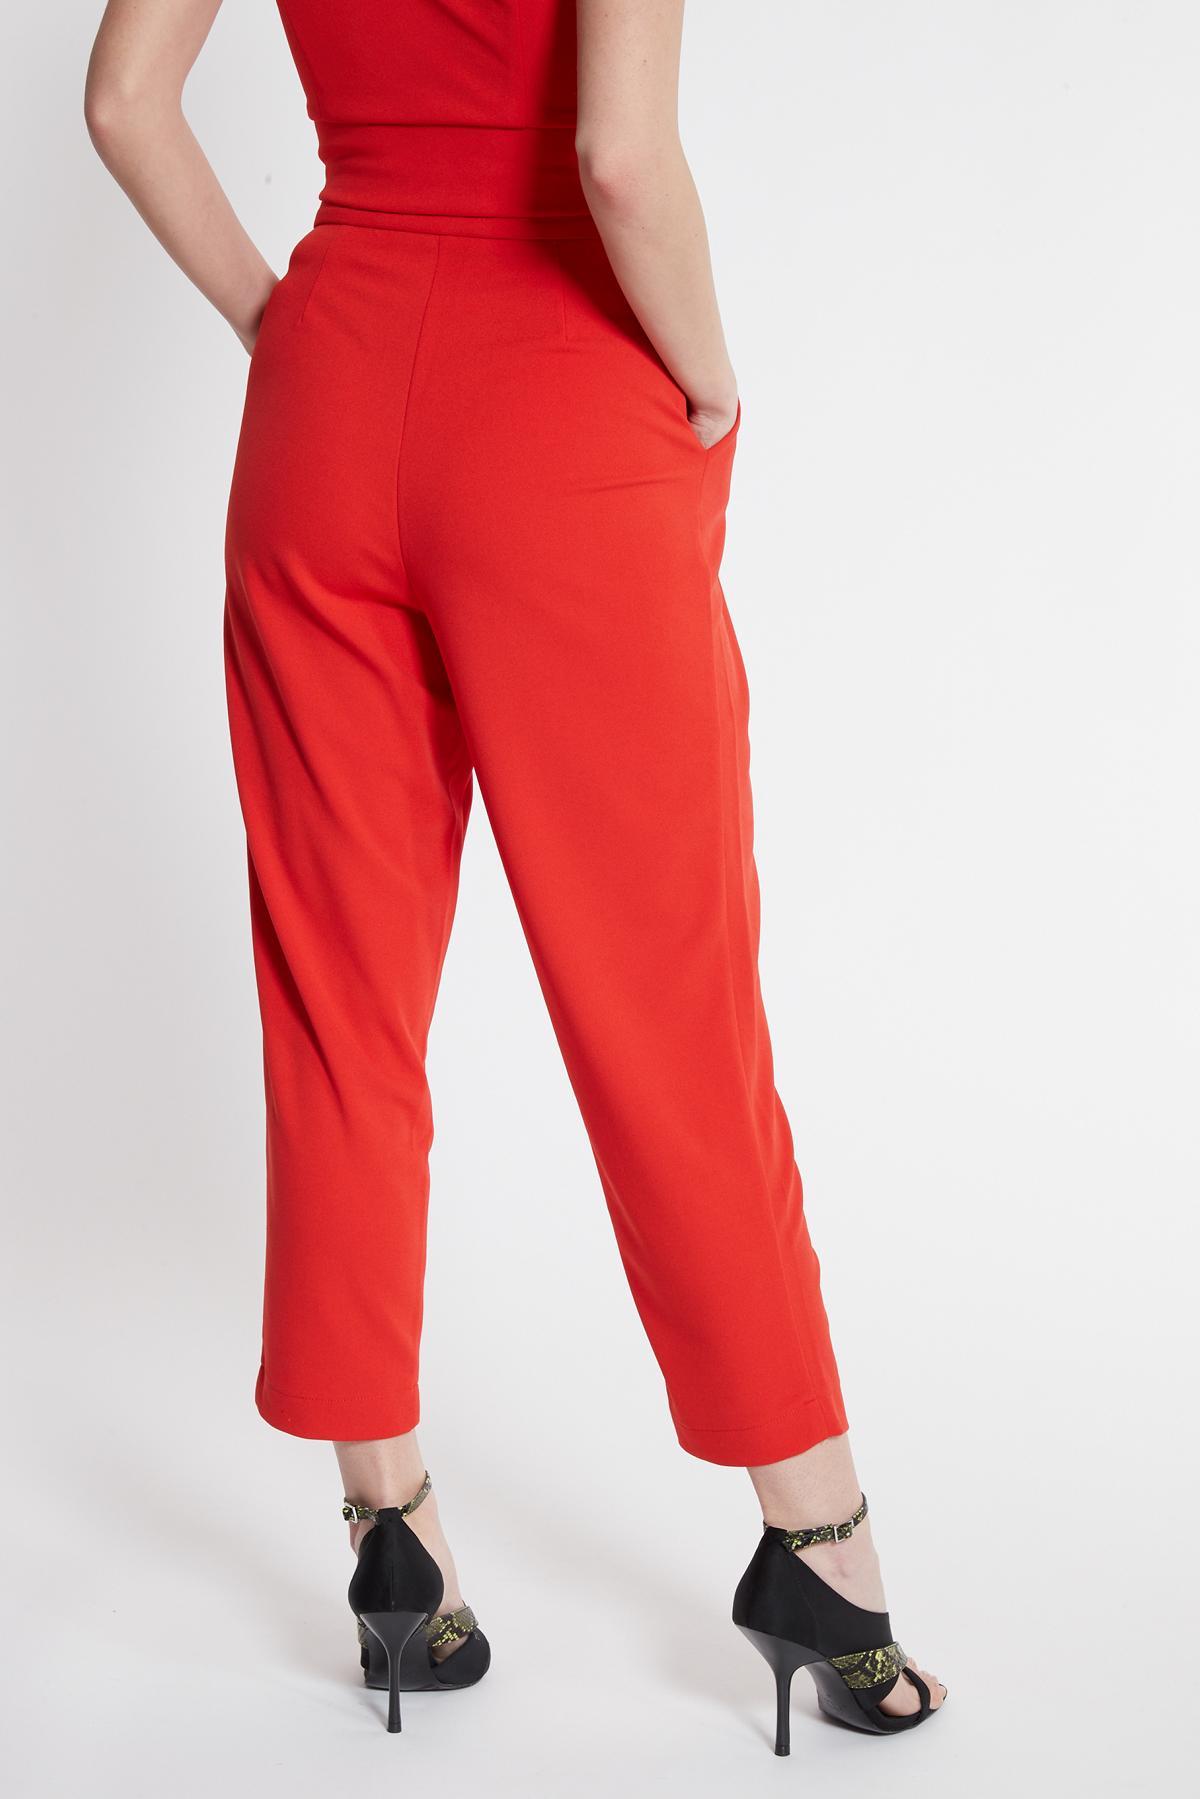 Rückansicht von Ana Alcazar Cropped Hose Seadone Rot  angezogen an Model